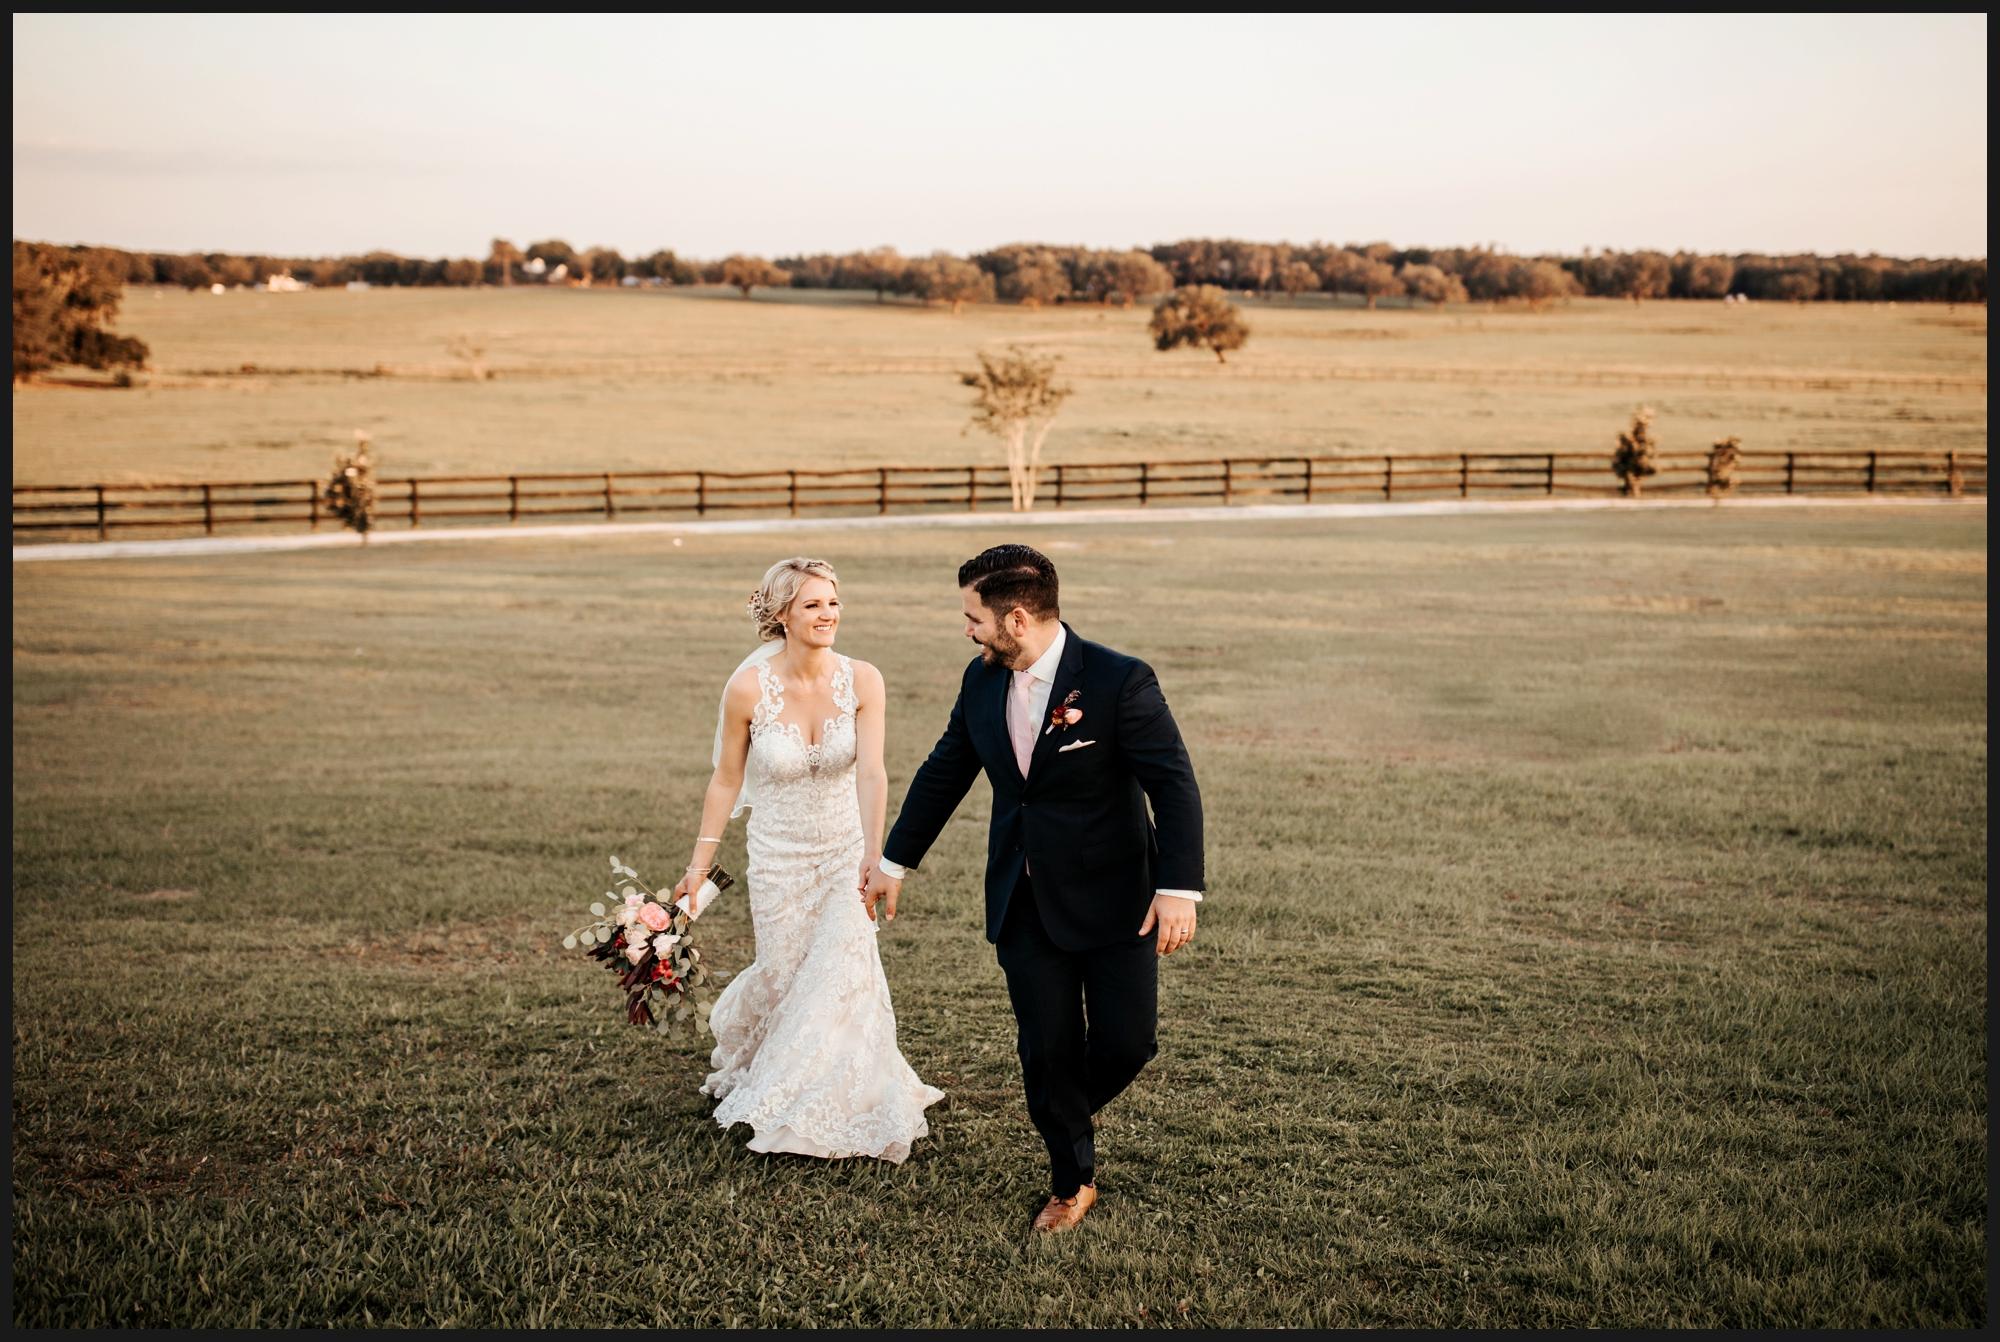 Orlando-Wedding-Photographer-destination-wedding-photographer-florida-wedding-photographer-hawaii-wedding-photographer_0615.jpg